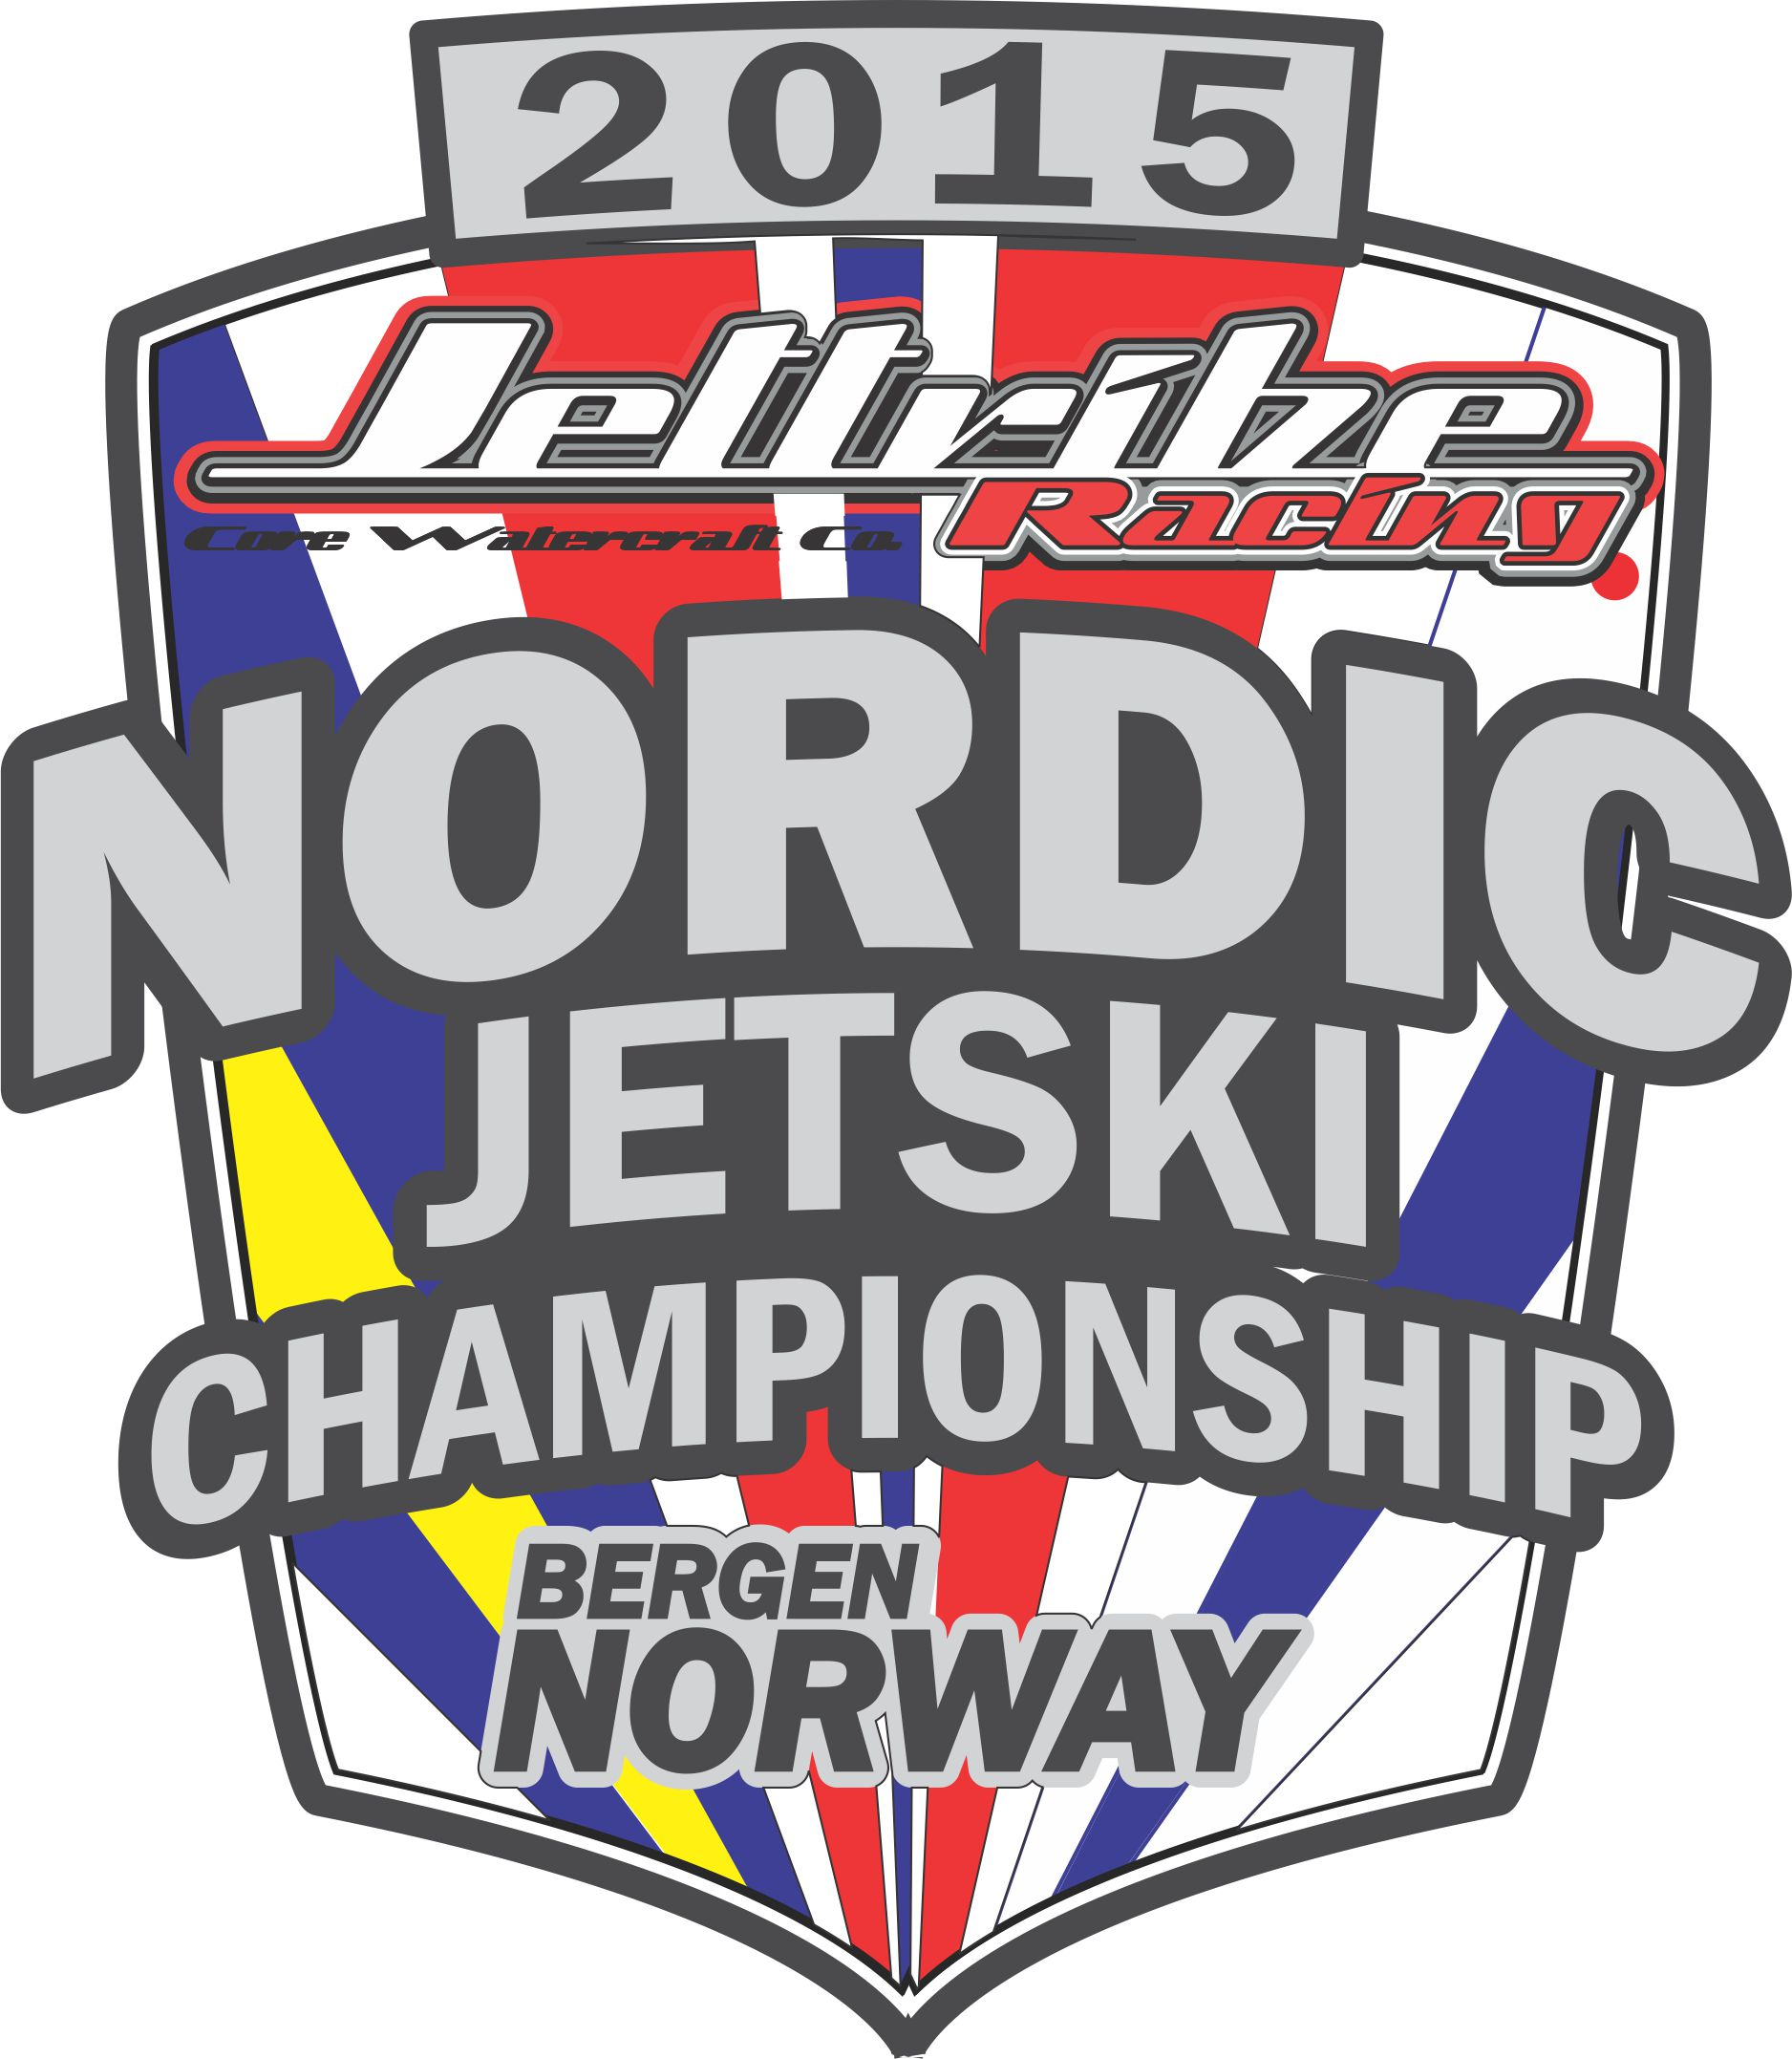 nordic-championship-norway-jpeg.jpg